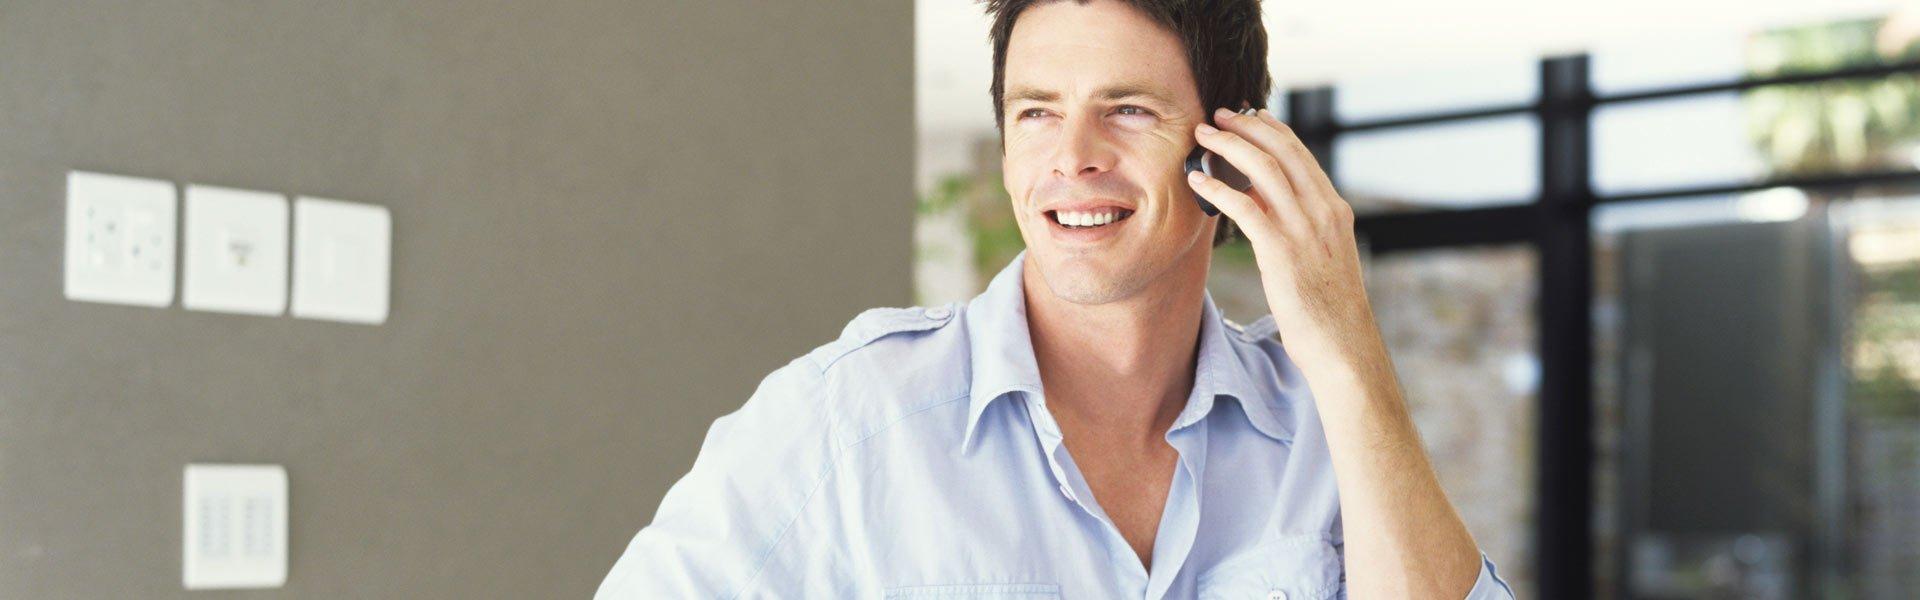 douglas communications systems man phone